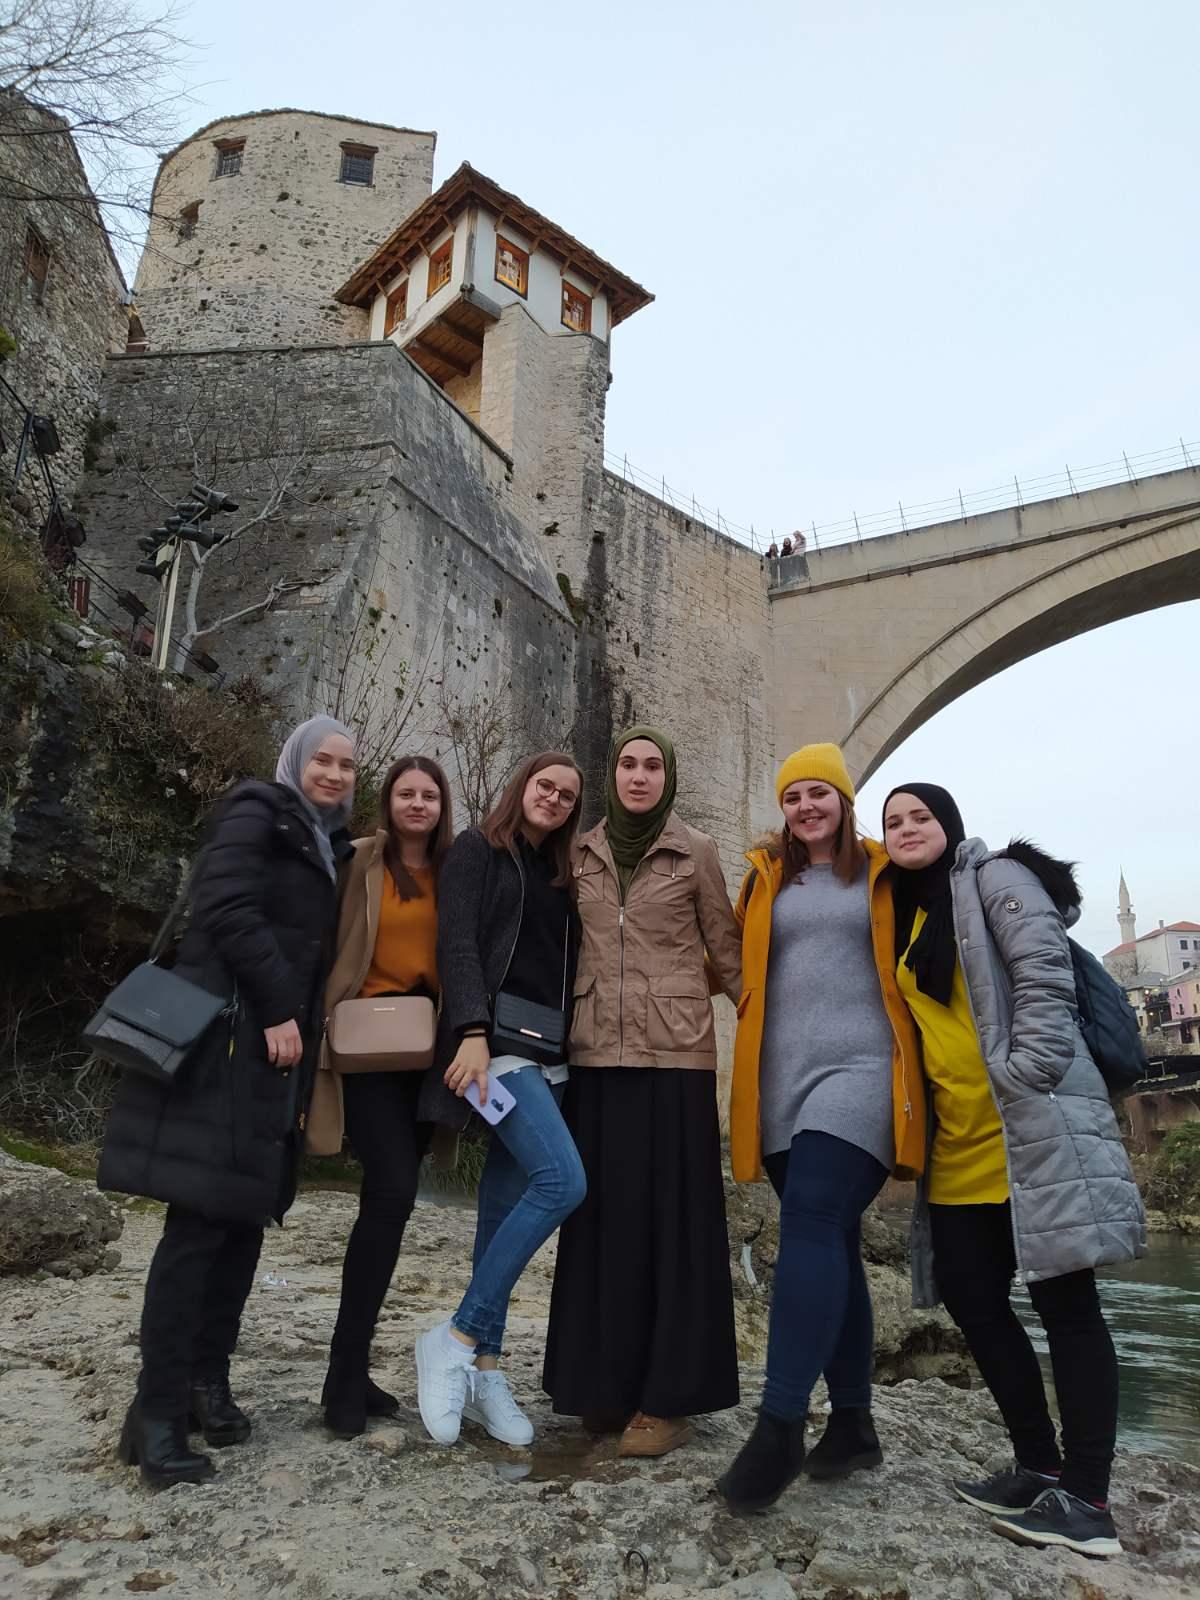 Vrsnjacko mentorstvo trening Mostar 2020d